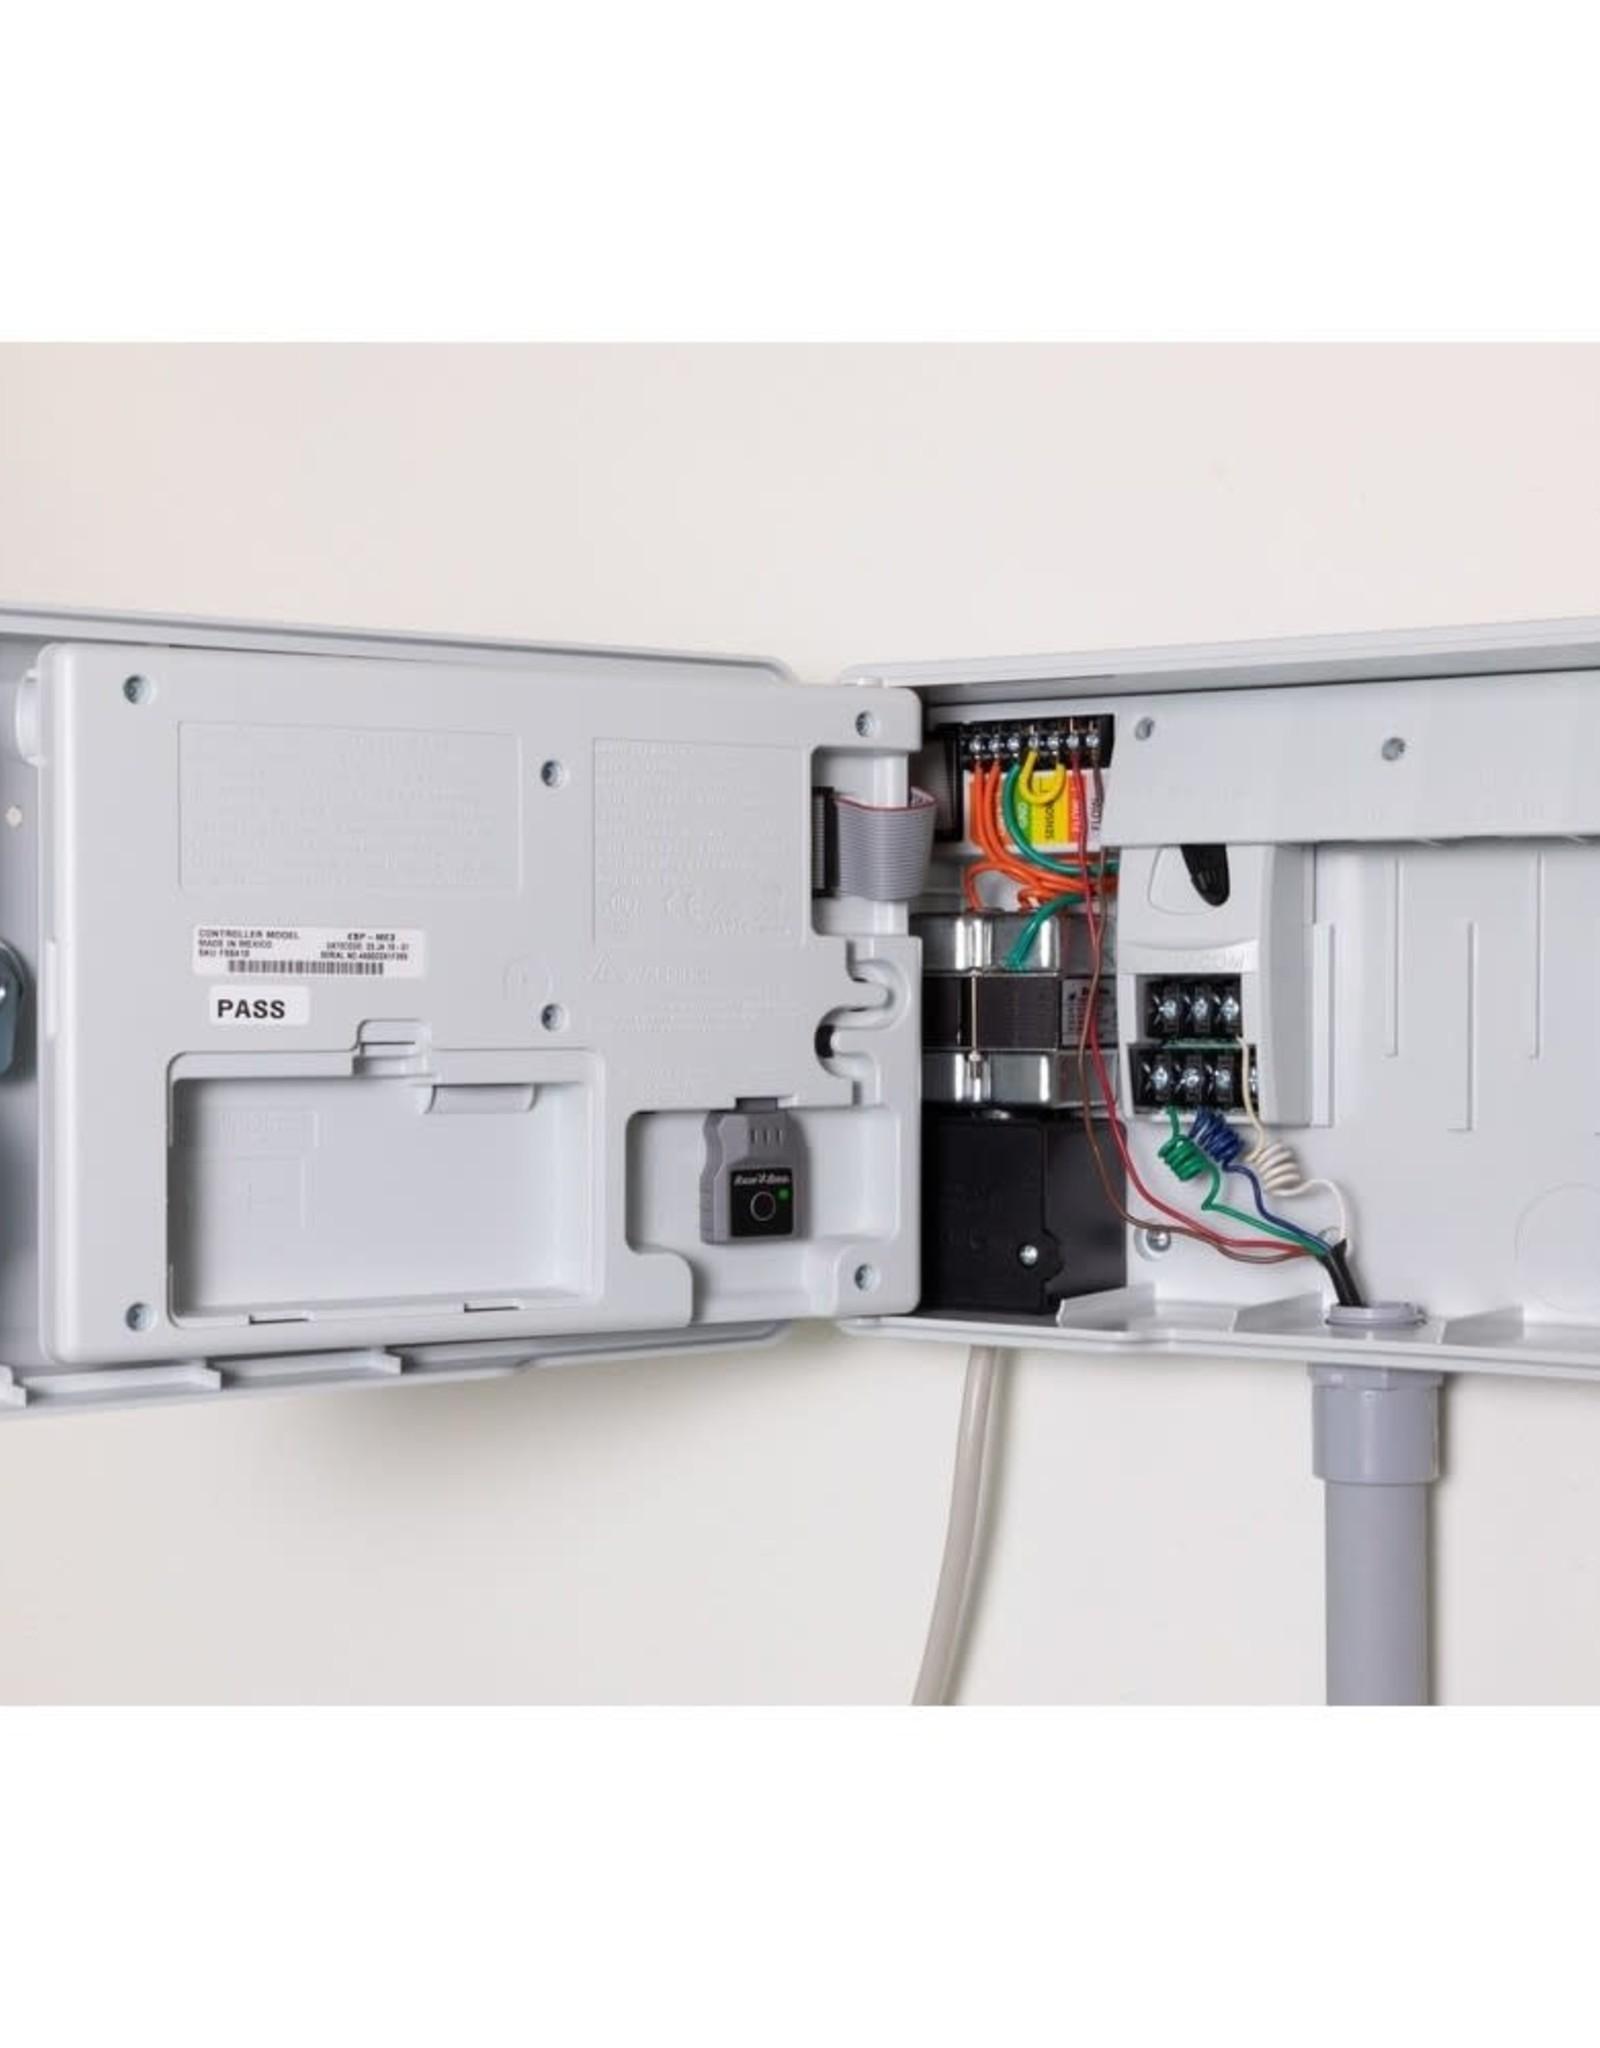 Rain Bird Rain Bird Modular Indoor/Outdoor LNK Wifi Smart Controller 4 Station ESP-ME3